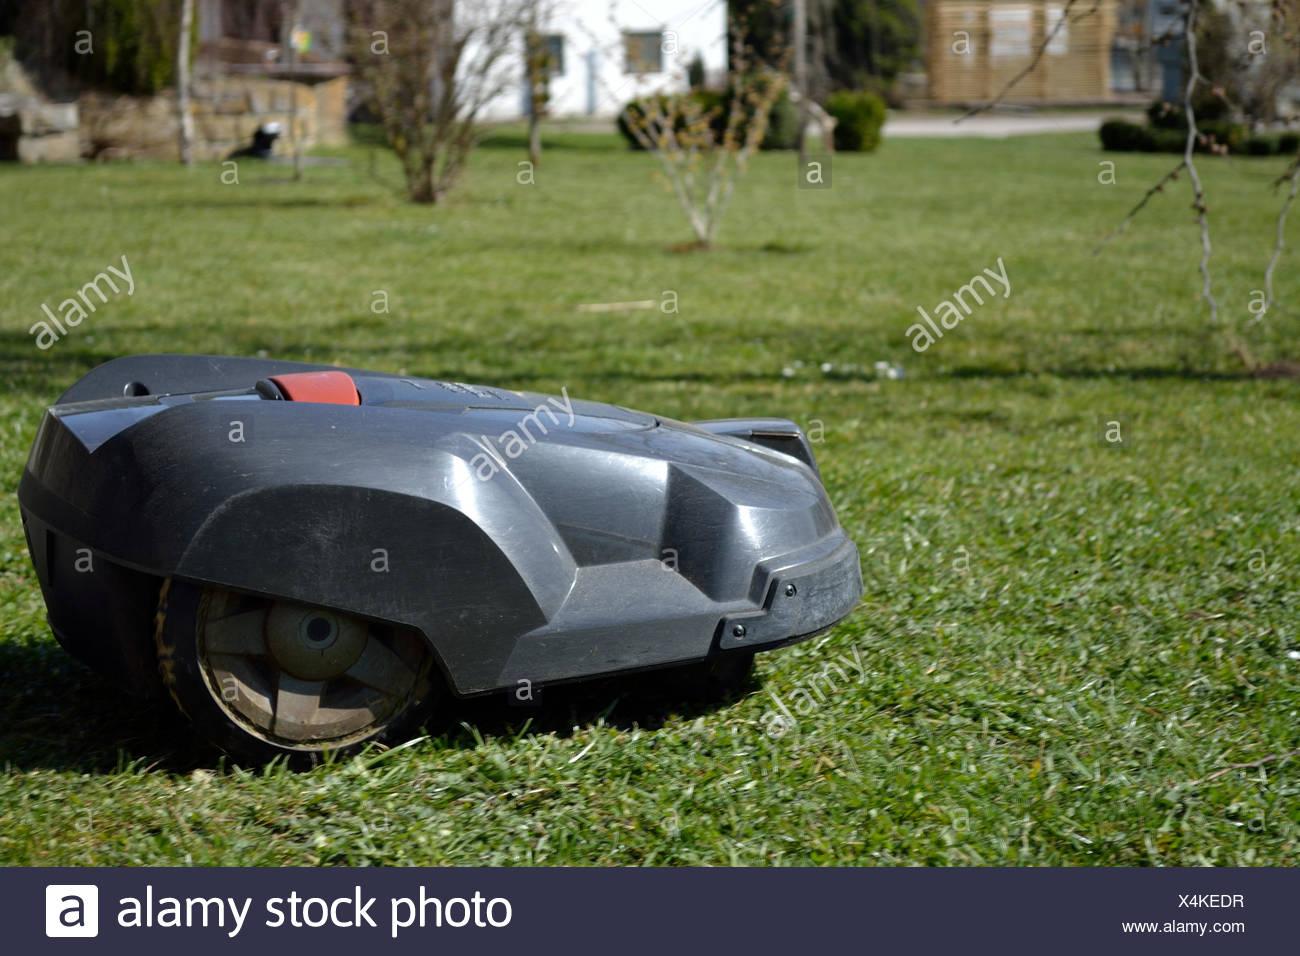 Rasenmaeherroboter sorgt selbststaendig fuer gepflegten Rasen Stock Photo